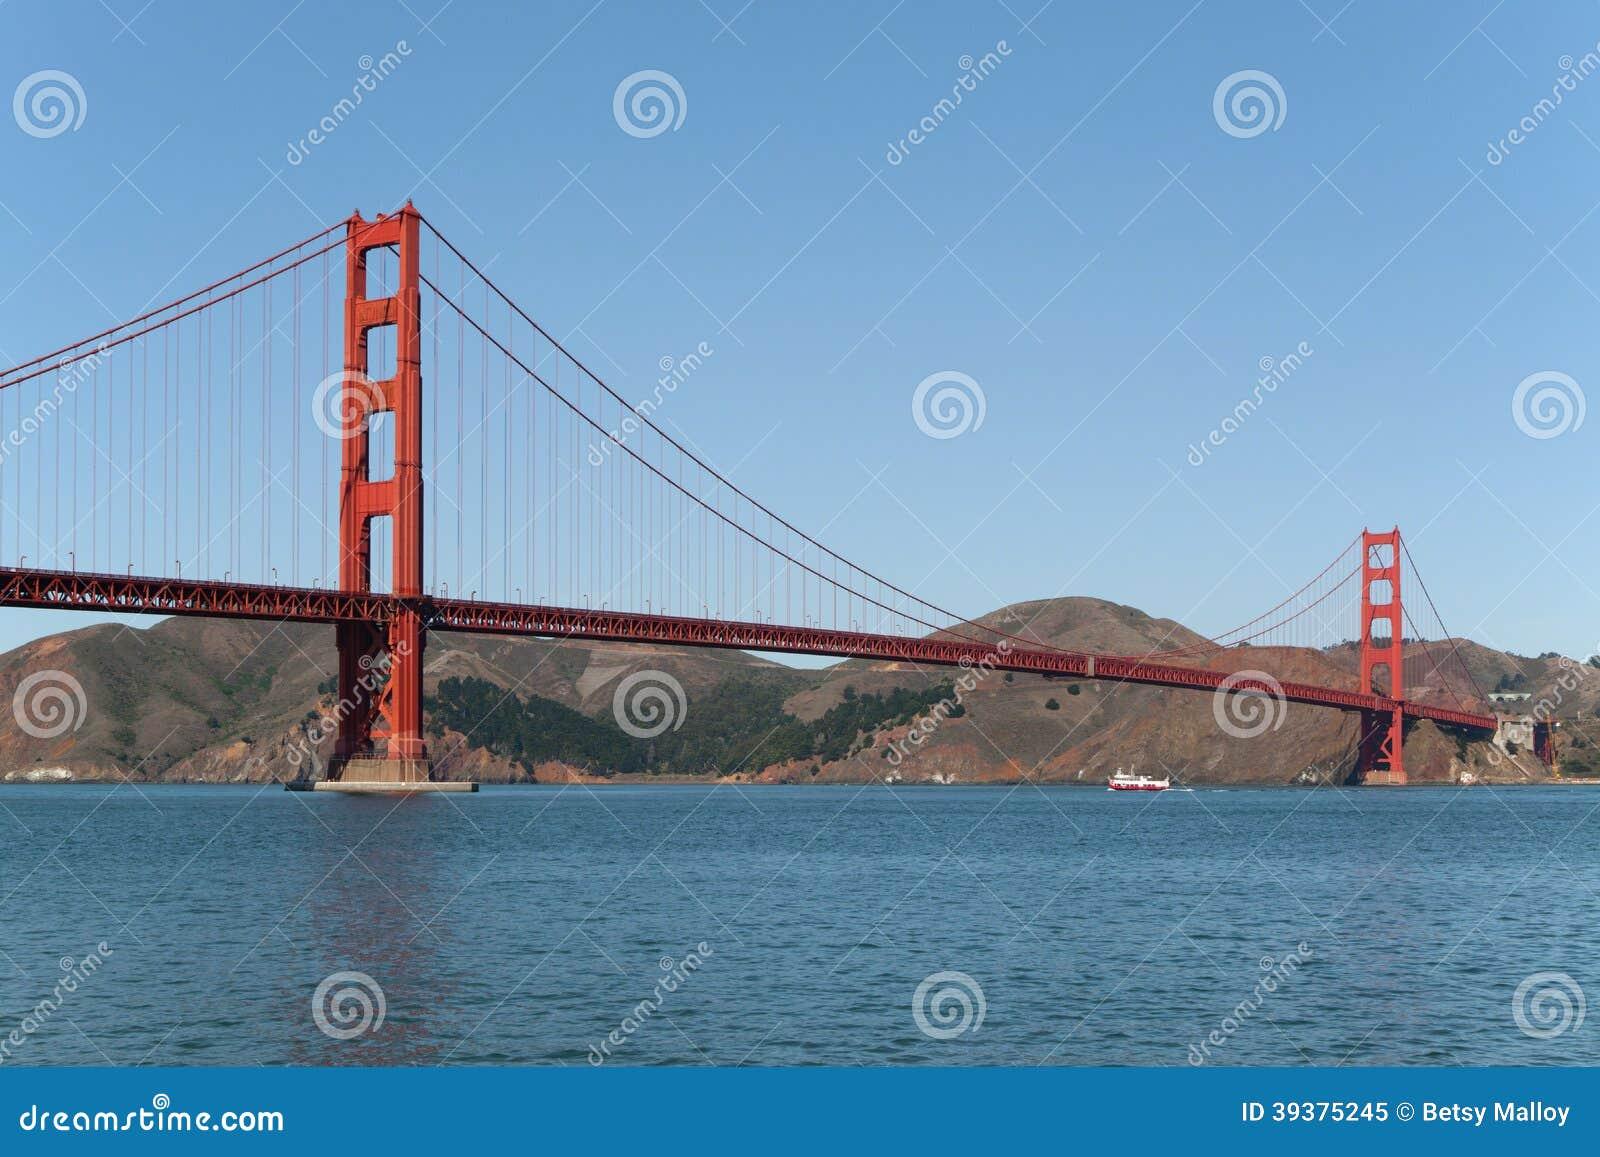 Golden Gate Bridge End to End